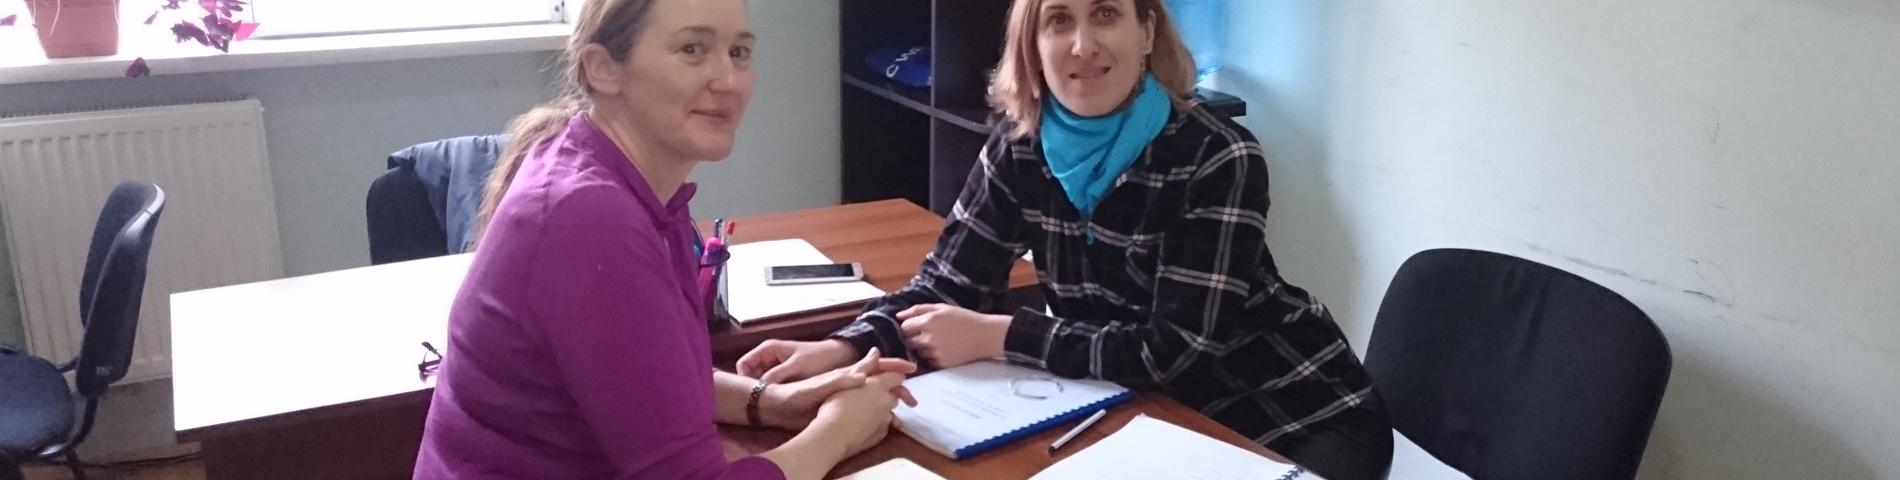 Languages And Tourism Centre Georgia kuva 1